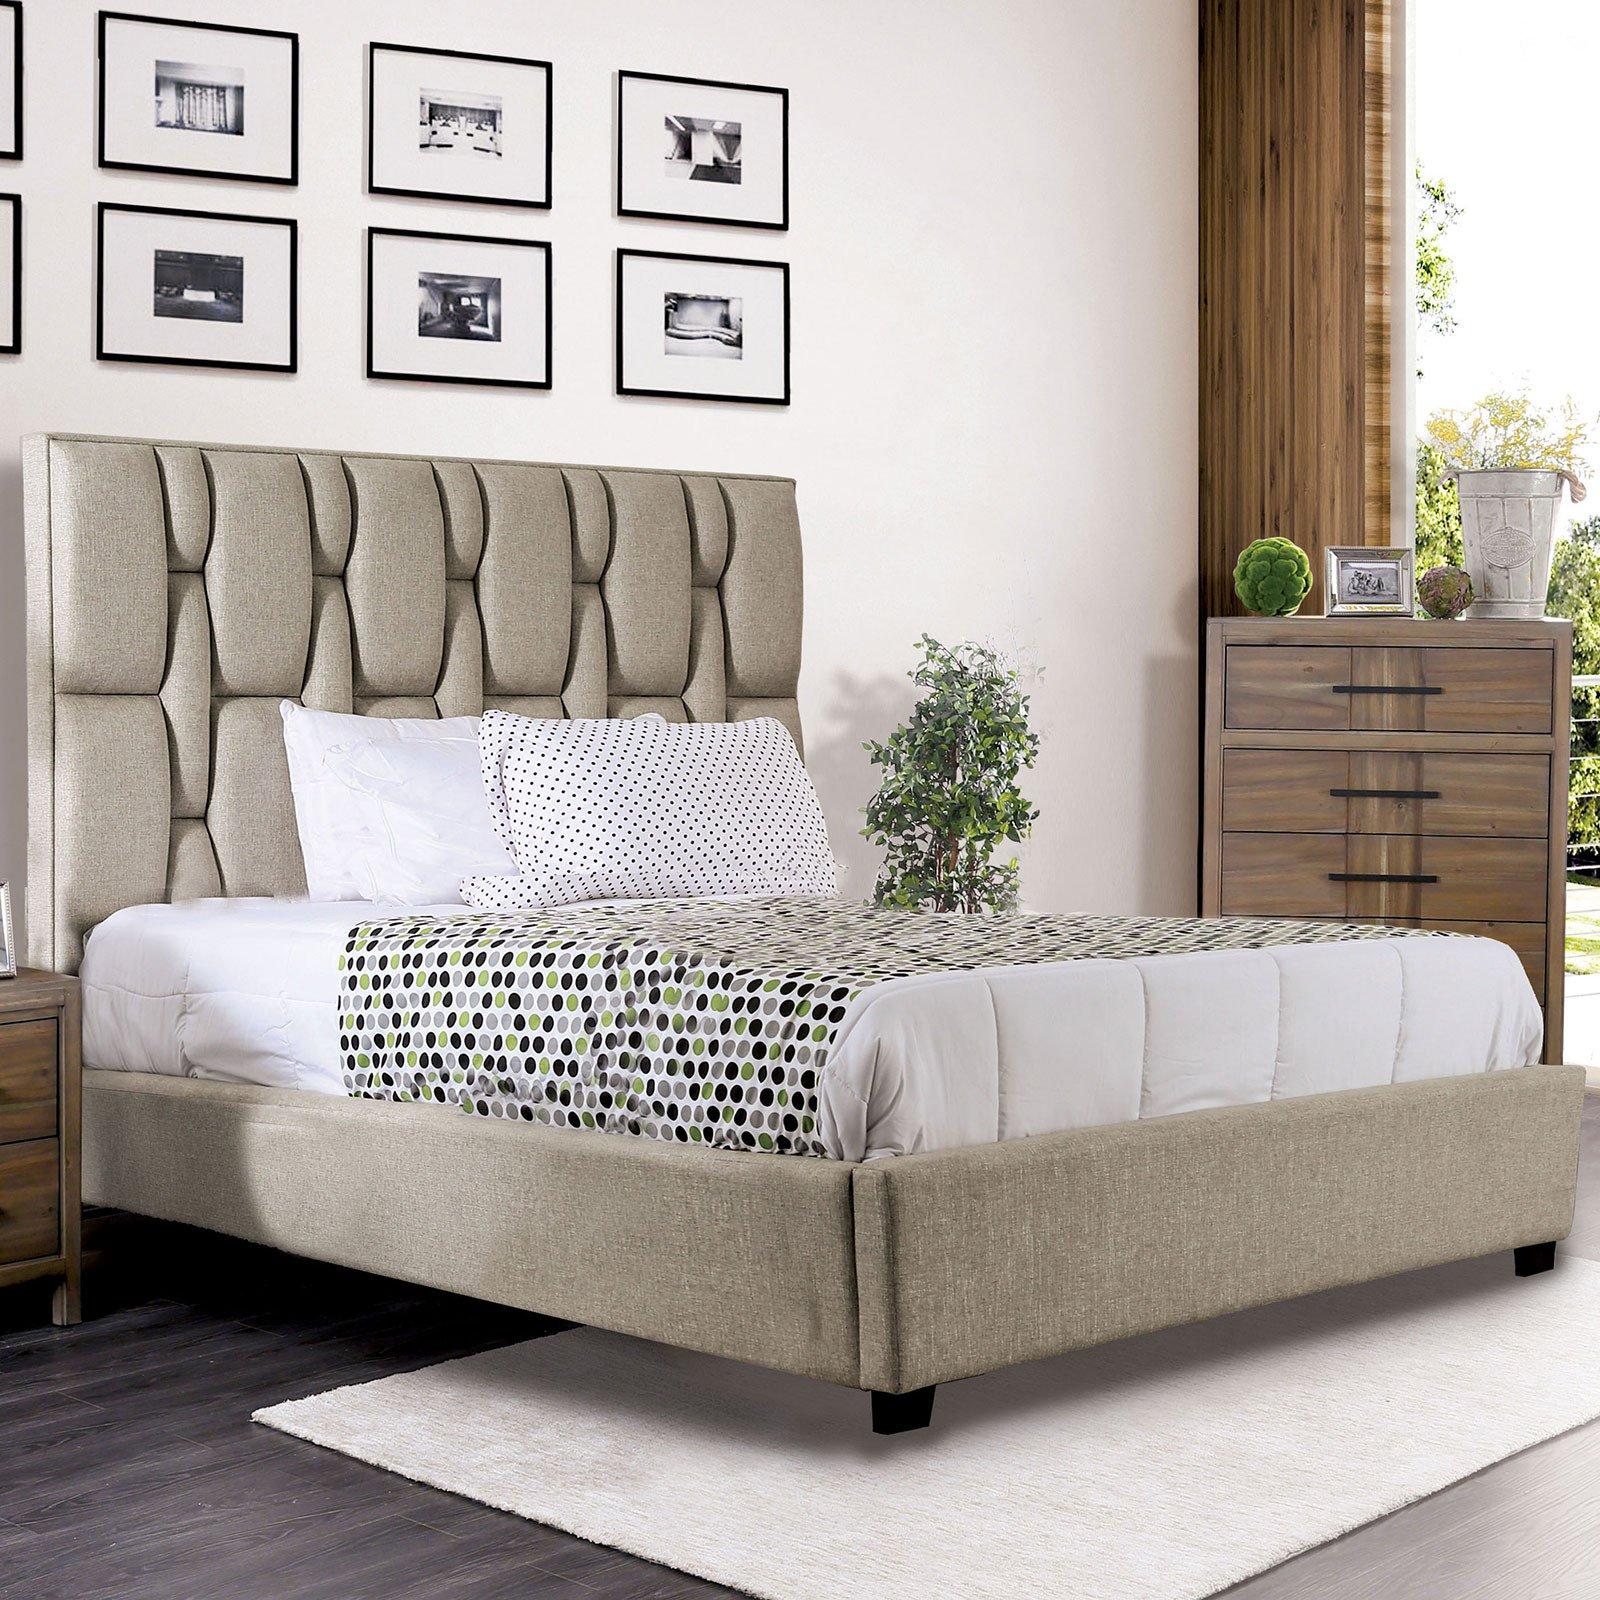 Tufted King Bedroom Set Elegant Furniture Of America Deirdre California King Upholstered Bed In Beige